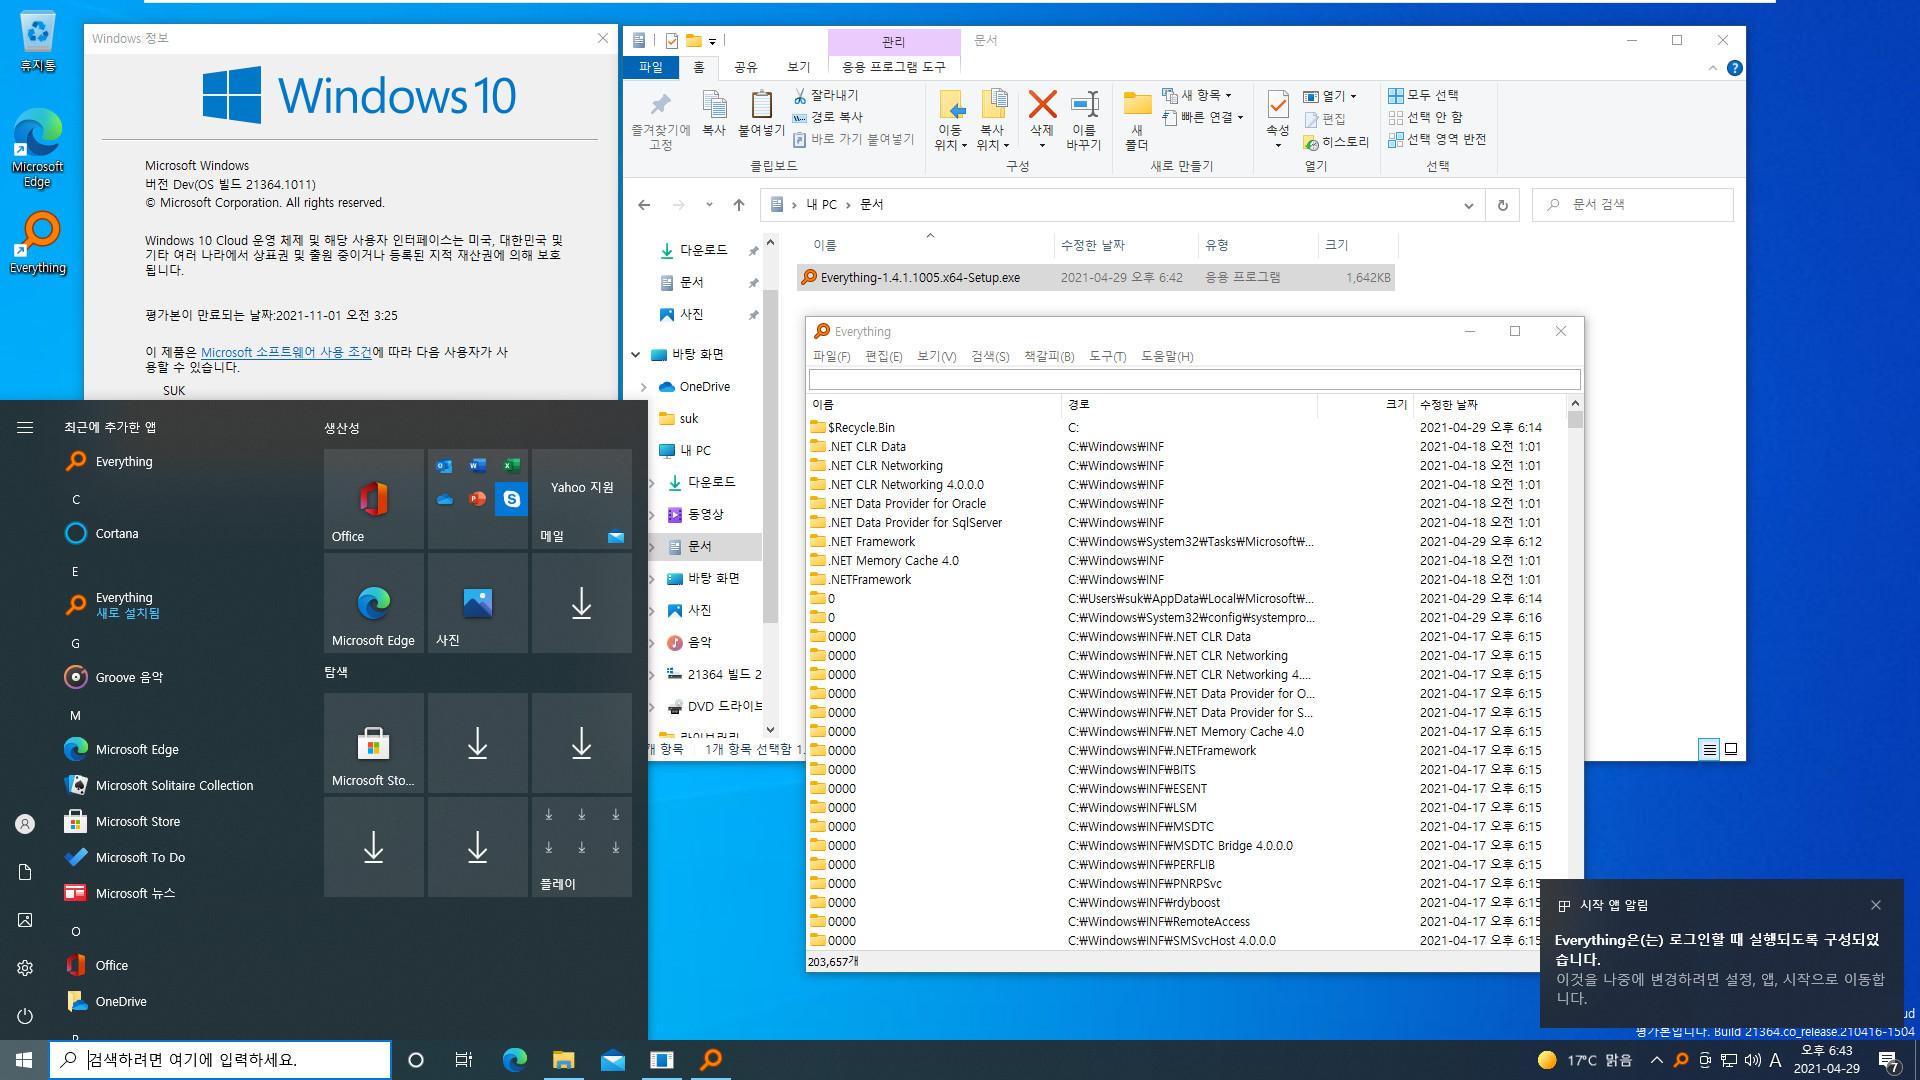 Windows 10 인사이더 프리뷰 버전 Dev (버전 21H2 예상) 21364 빌드에 Cloud Edition 설치 + Pro와 전환 테스트 = 잘 전환됩니다 2021-04-29_184350.jpg